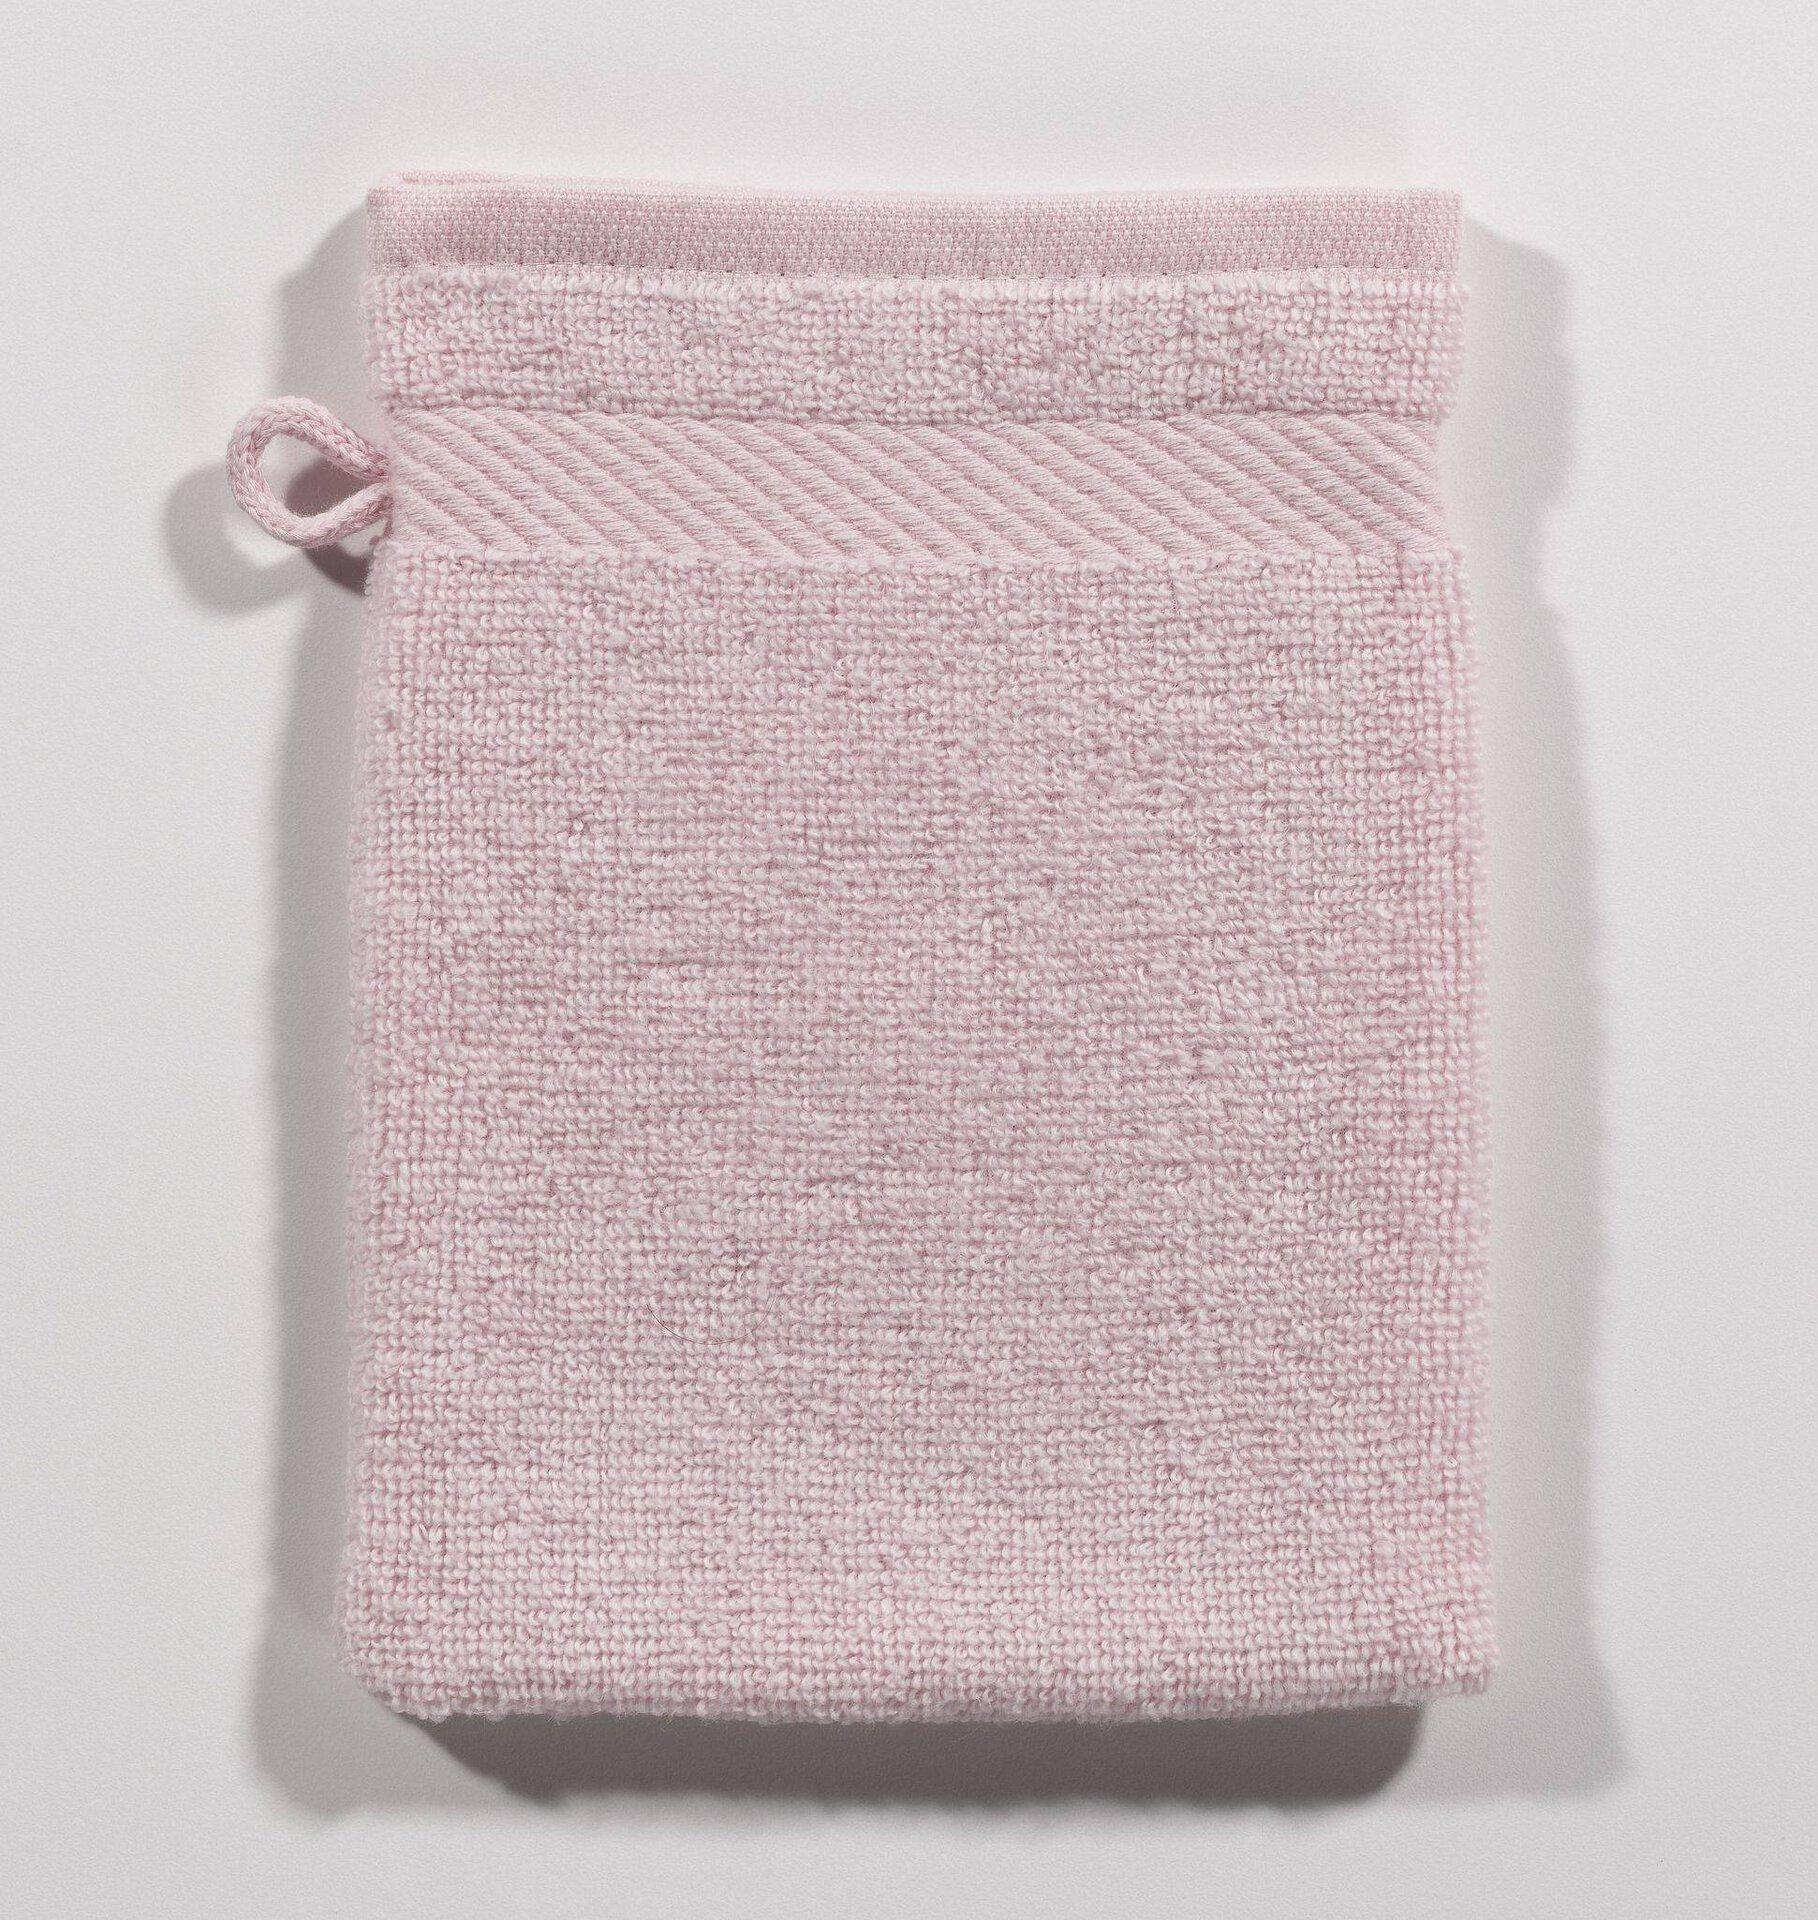 Waschhandschuh Micro Baumwolle Casa Nova Textil rosa 16 x 21 cm